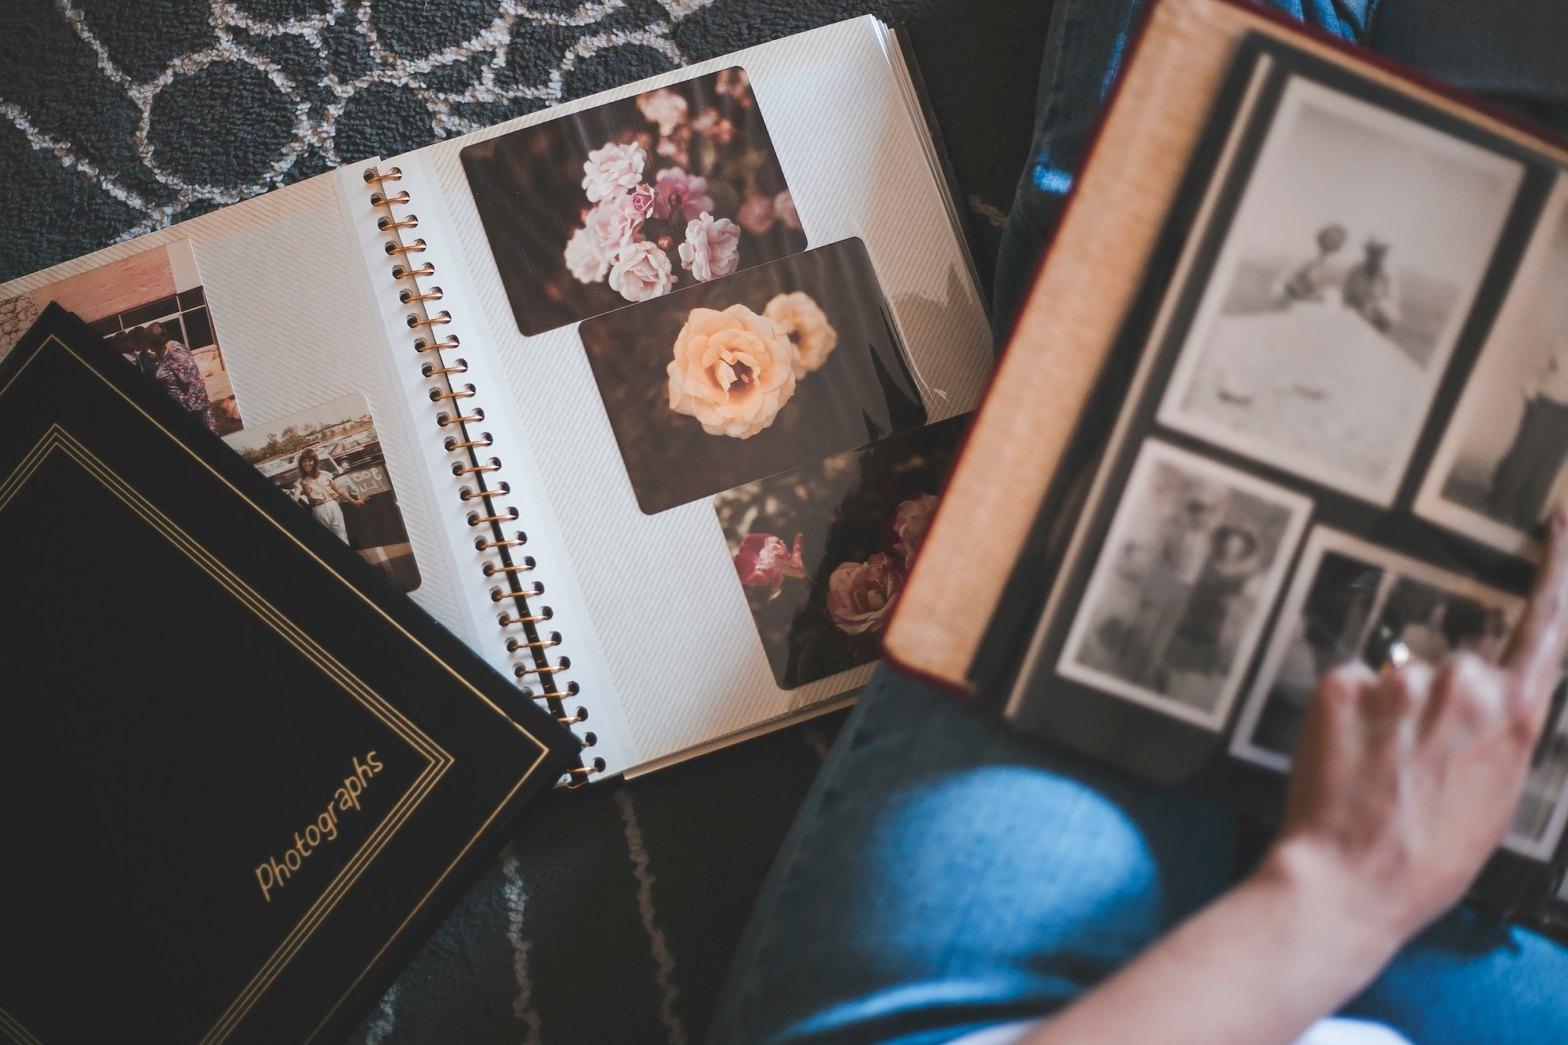 Browsing photo albums